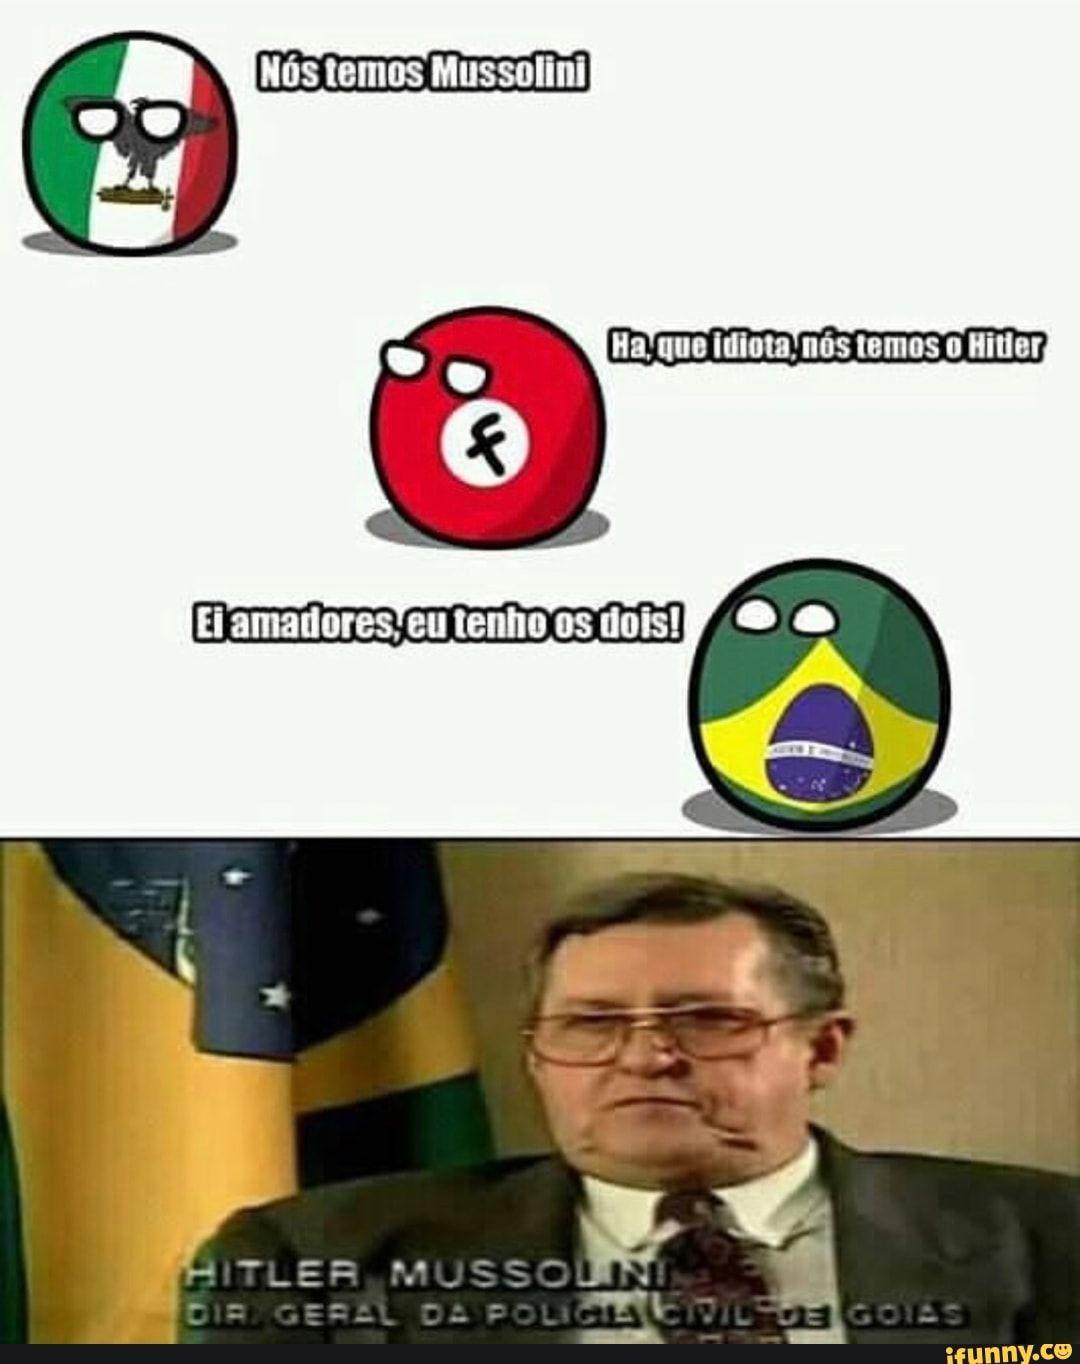 Picture Memes B46eqsci6 By Shutty 44 Comments Ifunny Piadas Tirinhas Engracadas Memes